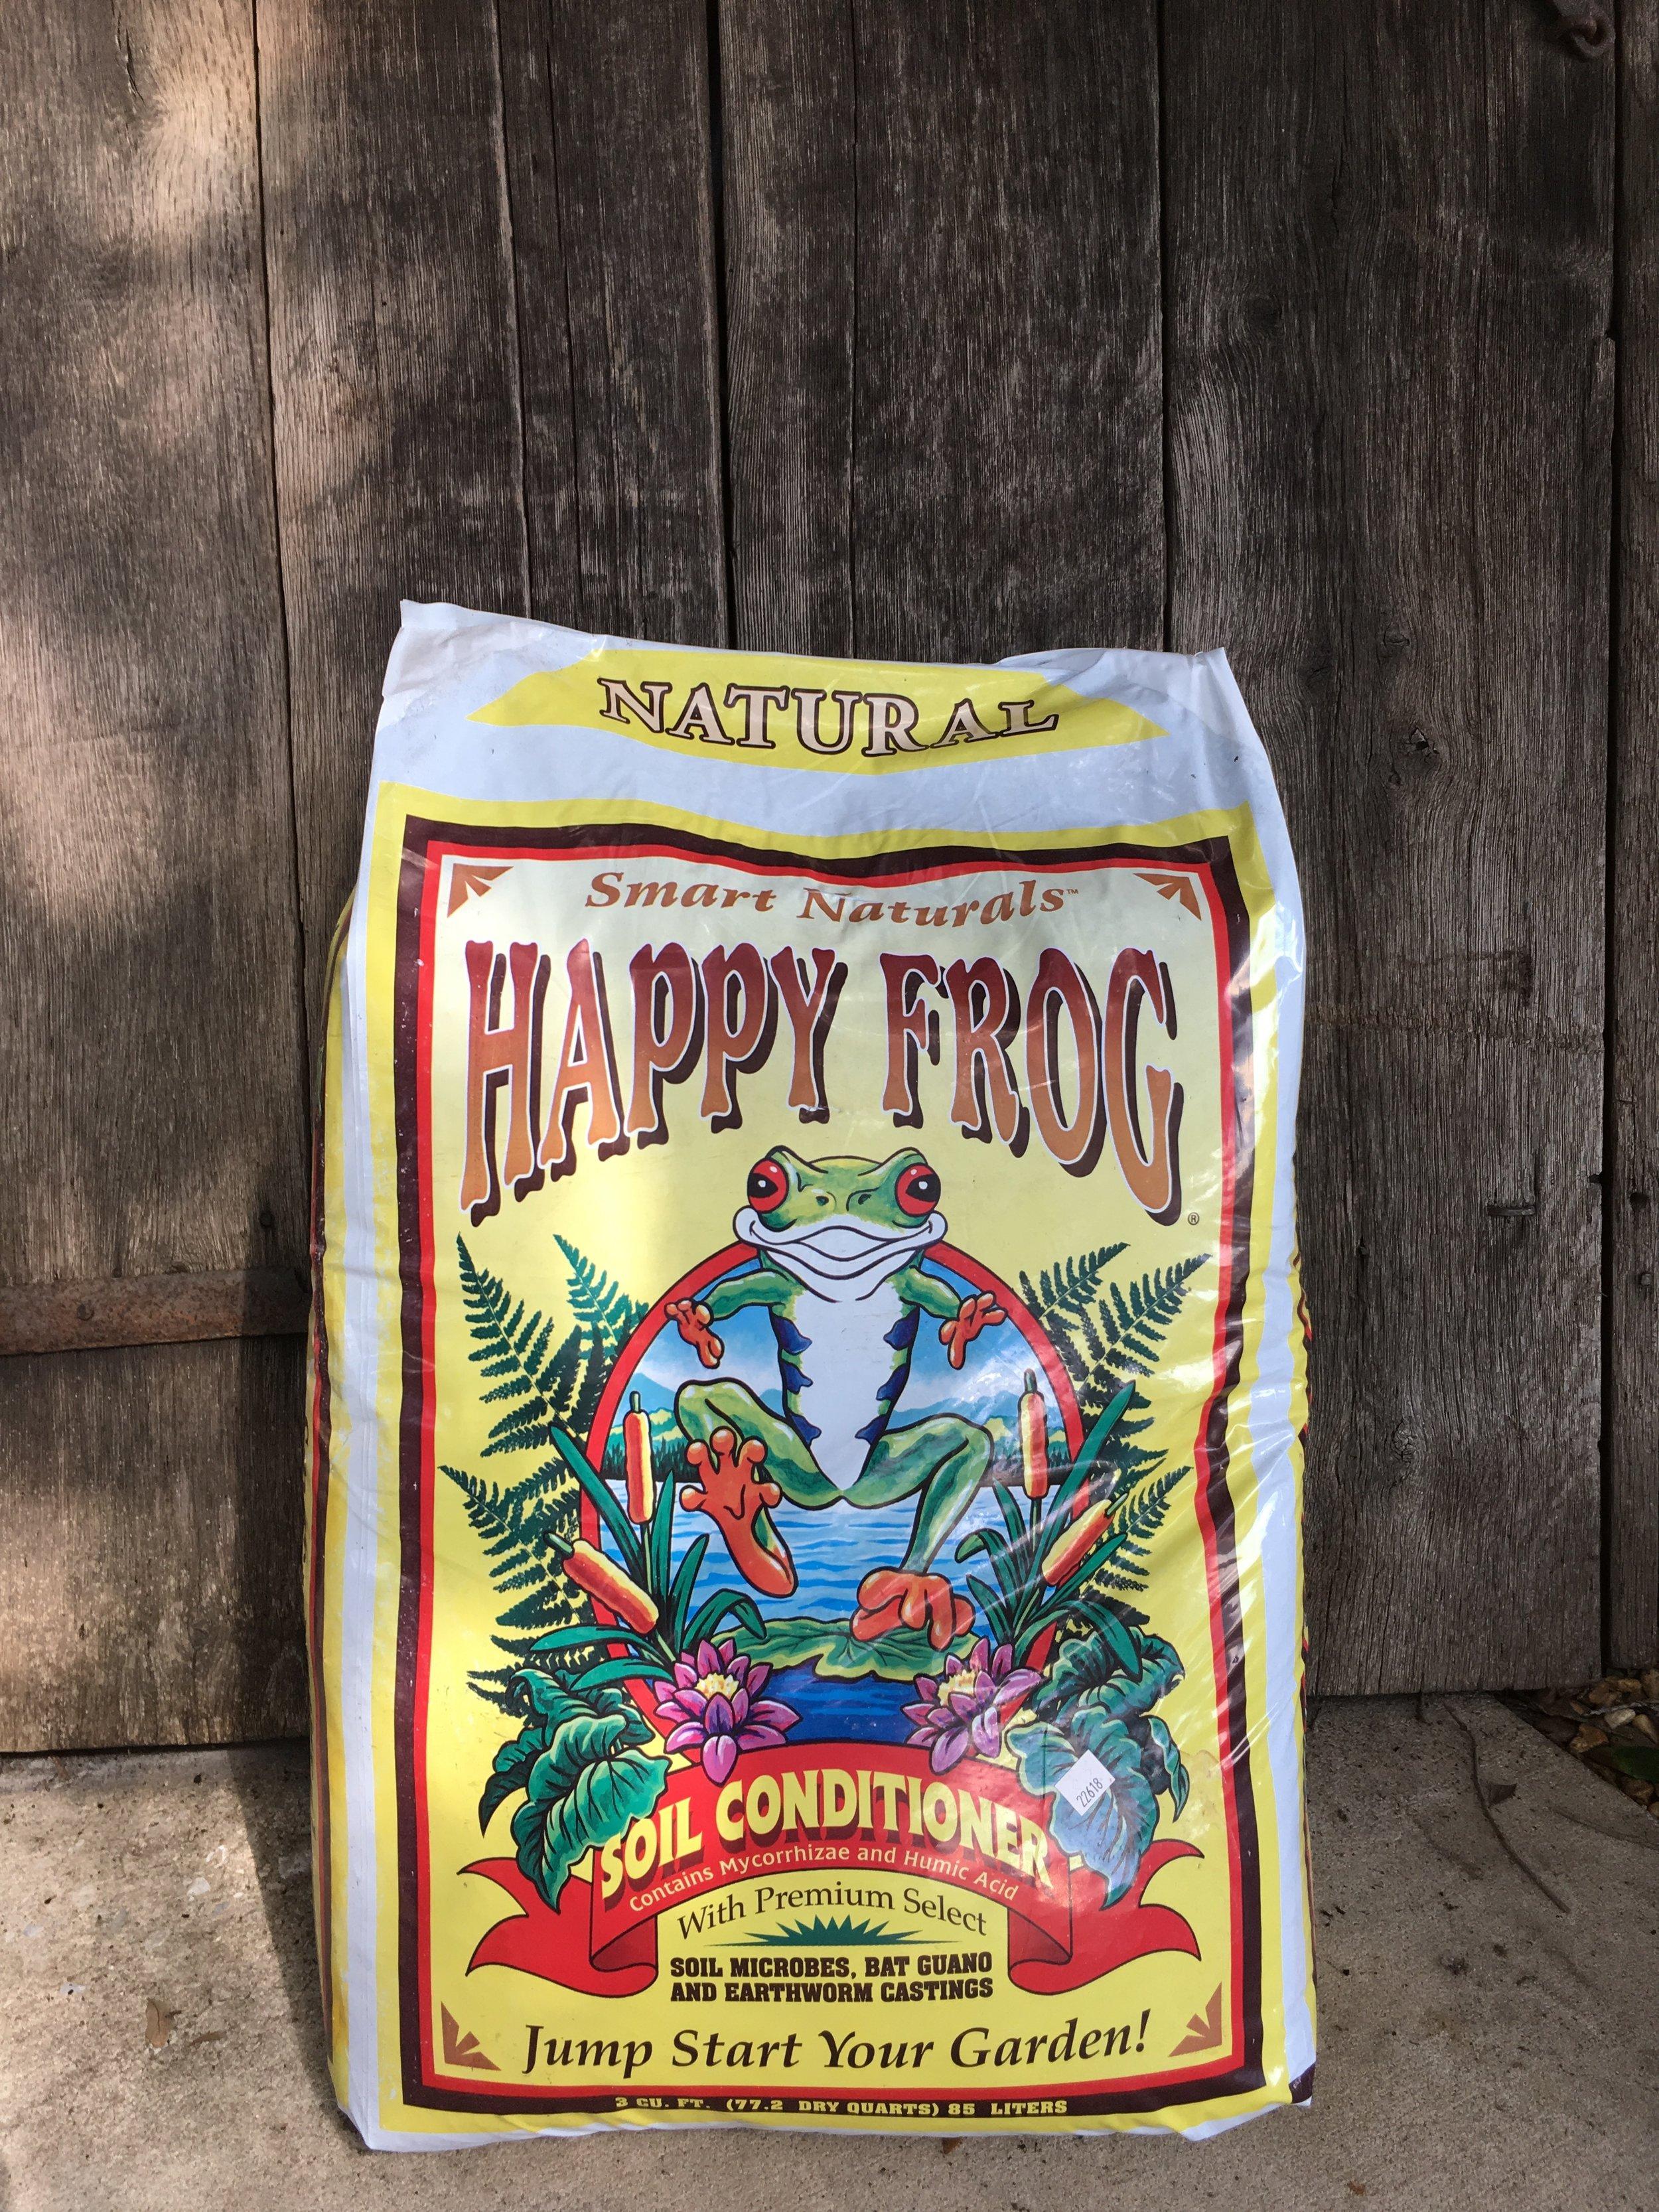 Happy Frog Soil Conditioner.jpg